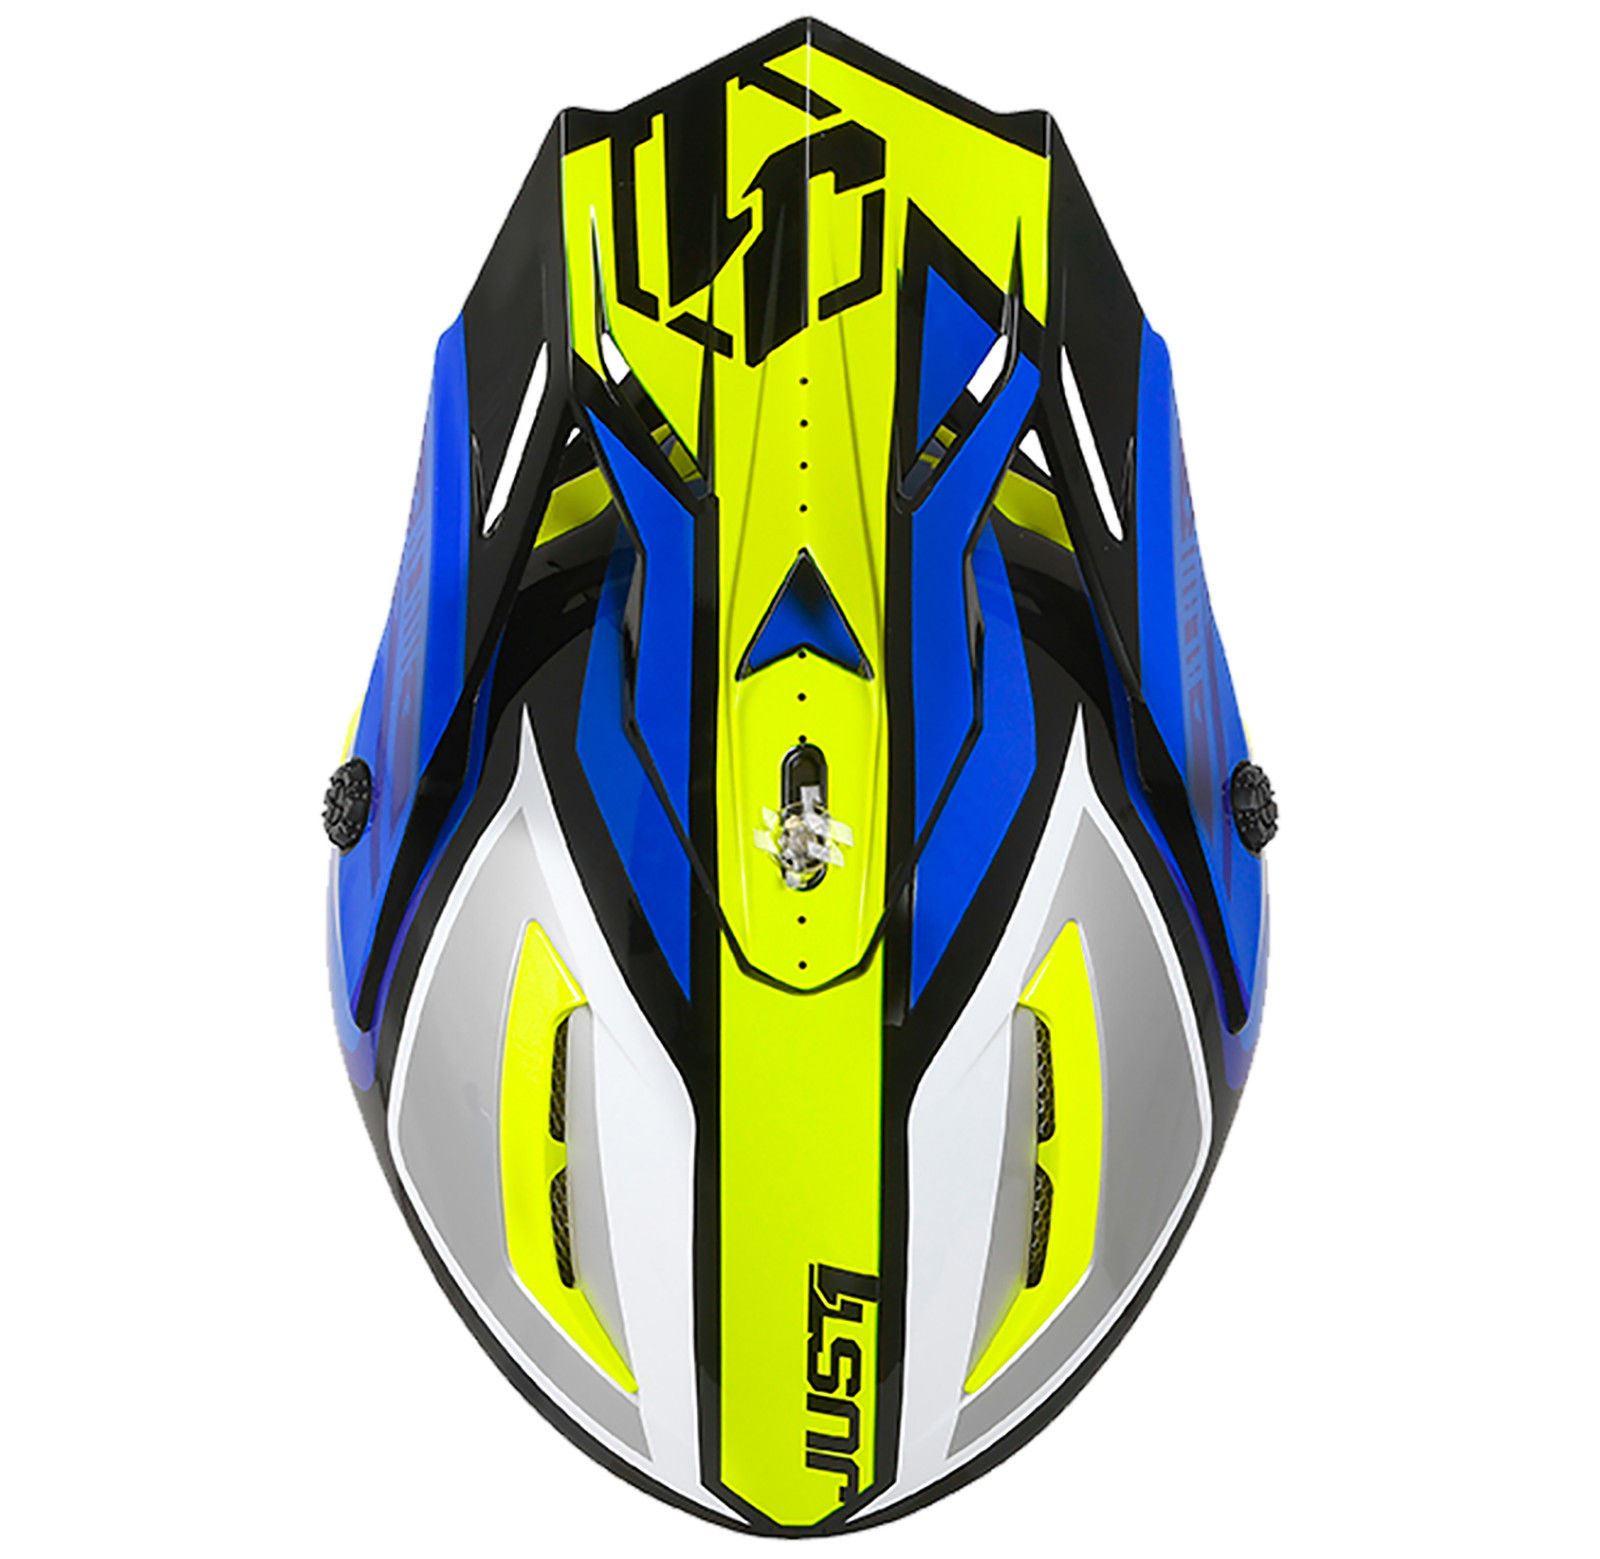 Just1-J38-Blade-Helmet-Motocross-Enduro-MX-ATV-Motorcycle-Off-Road-Full-Face-ACU thumbnail 18